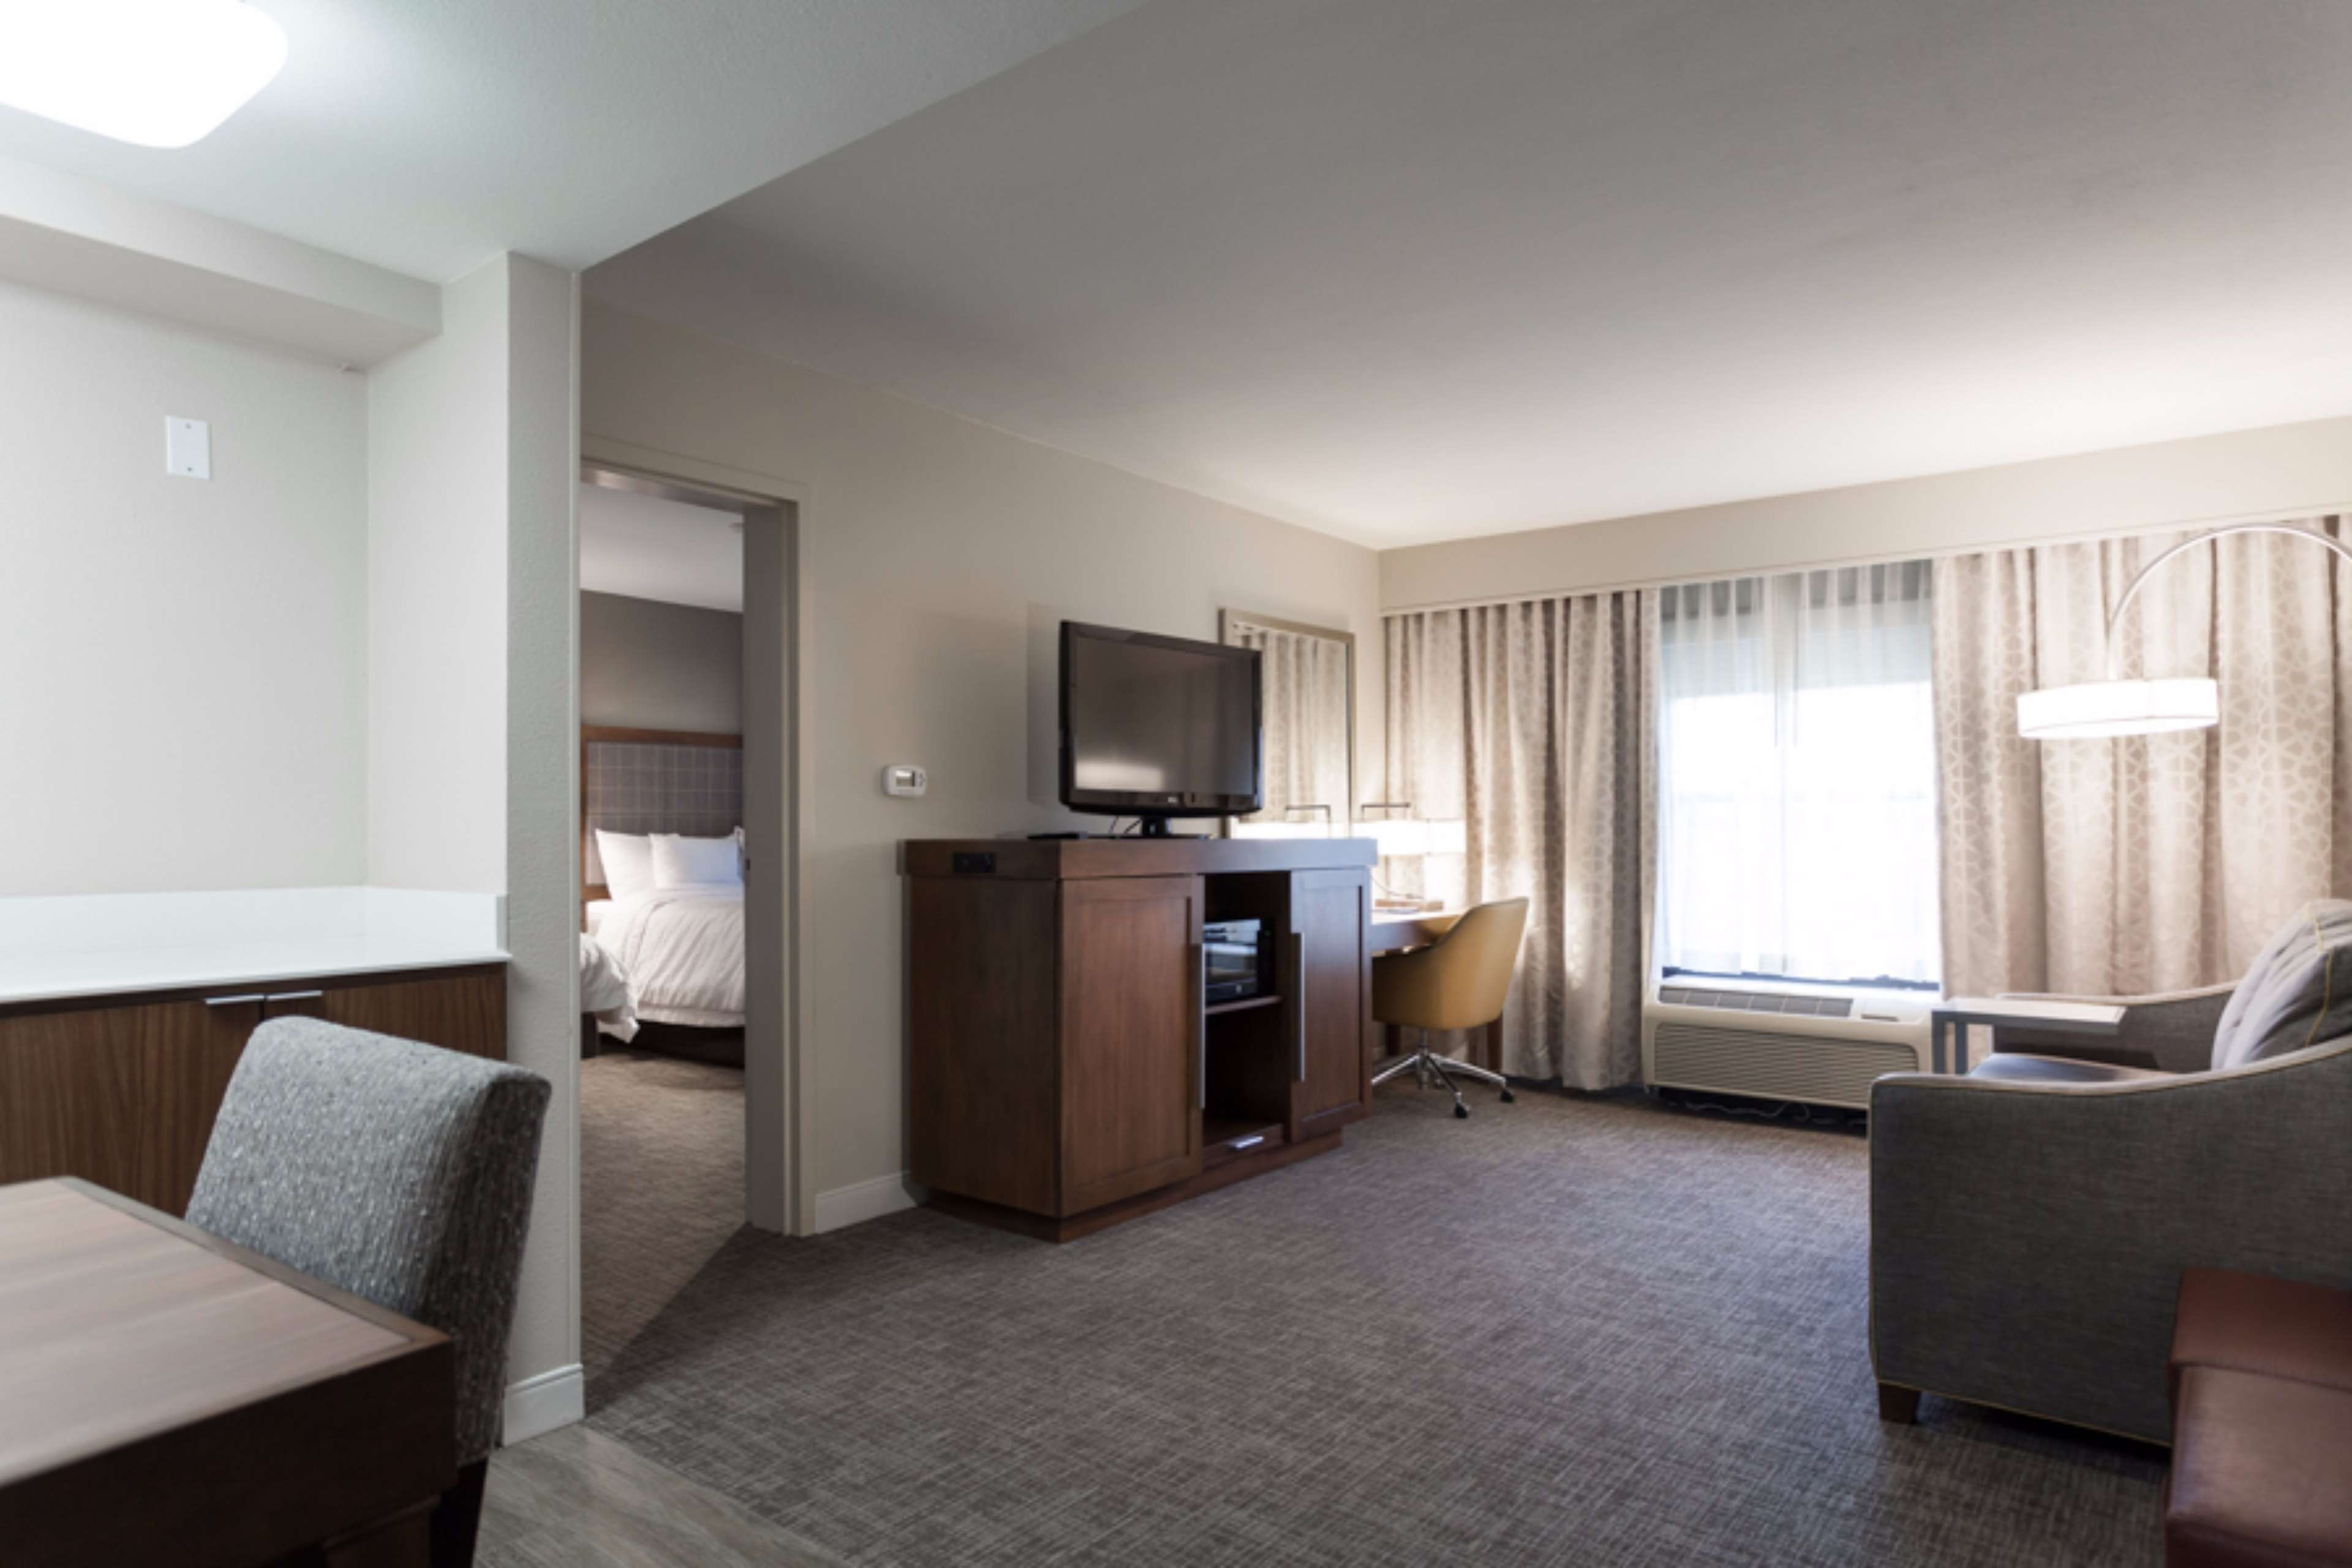 Hampton Inn & Suites Dallas-DFW Airport North-Grapevine image 22